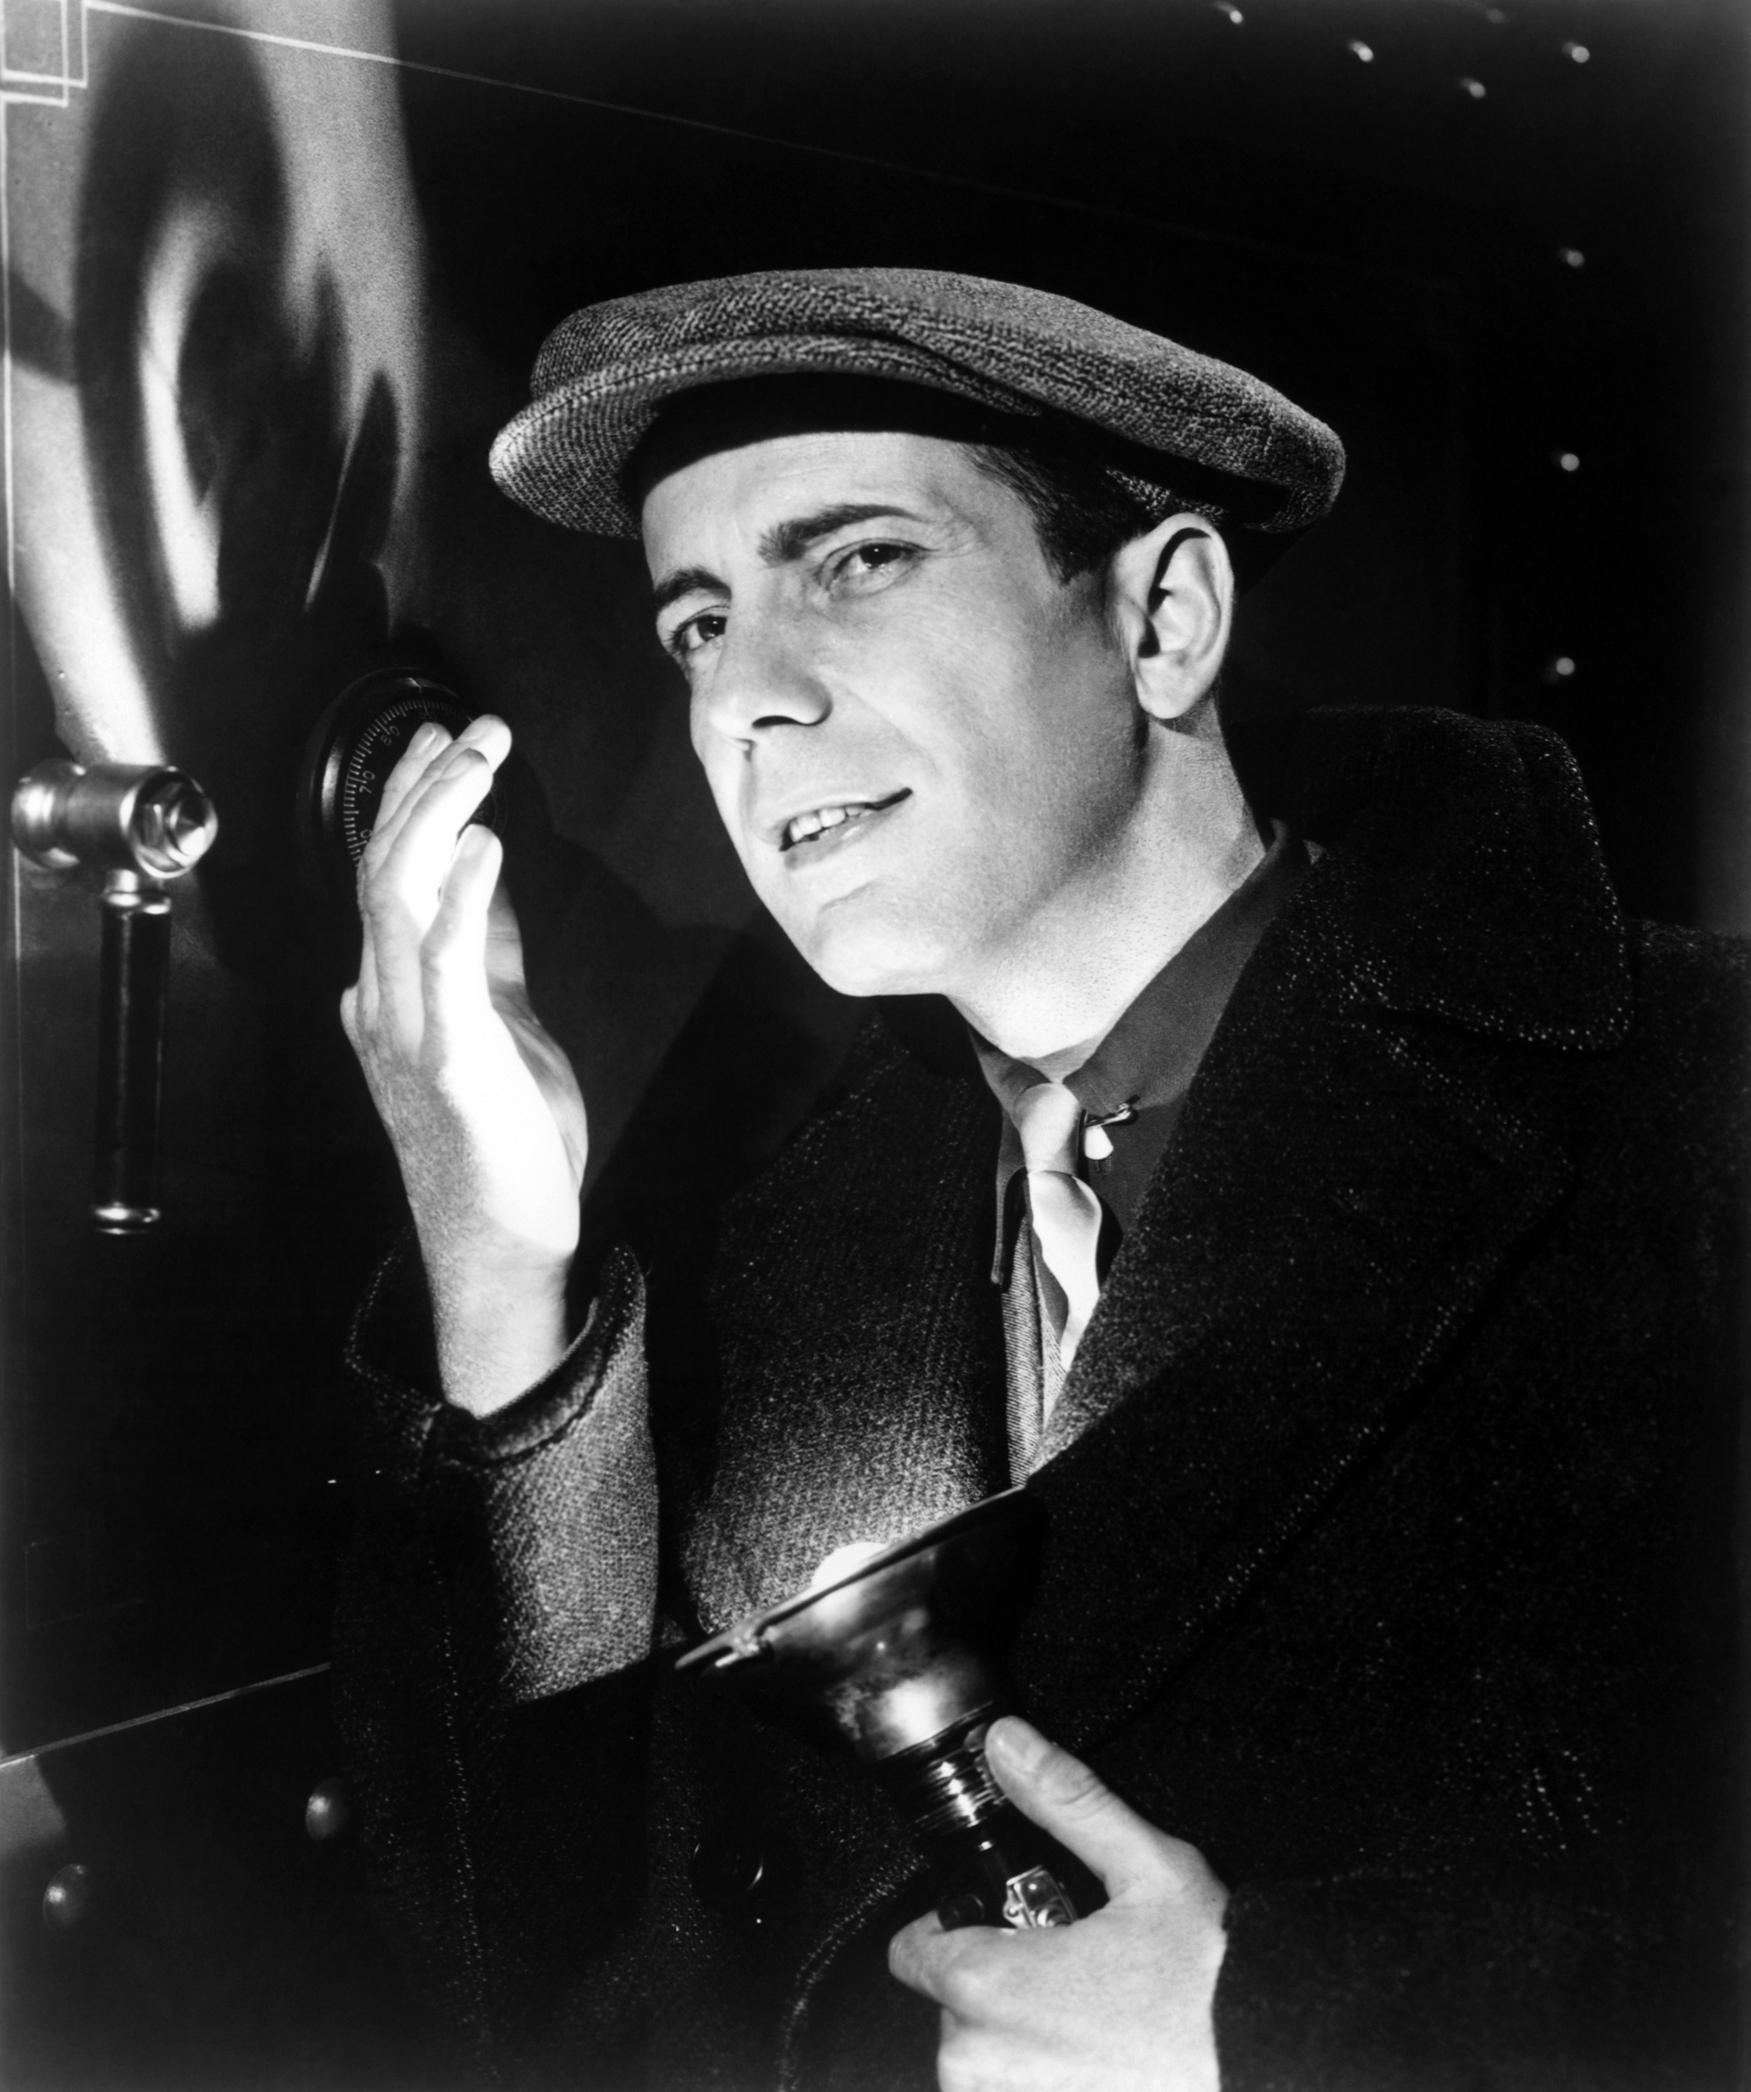 Humphrey Bogart in The Amazing Dr. Clitterhouse (1938)